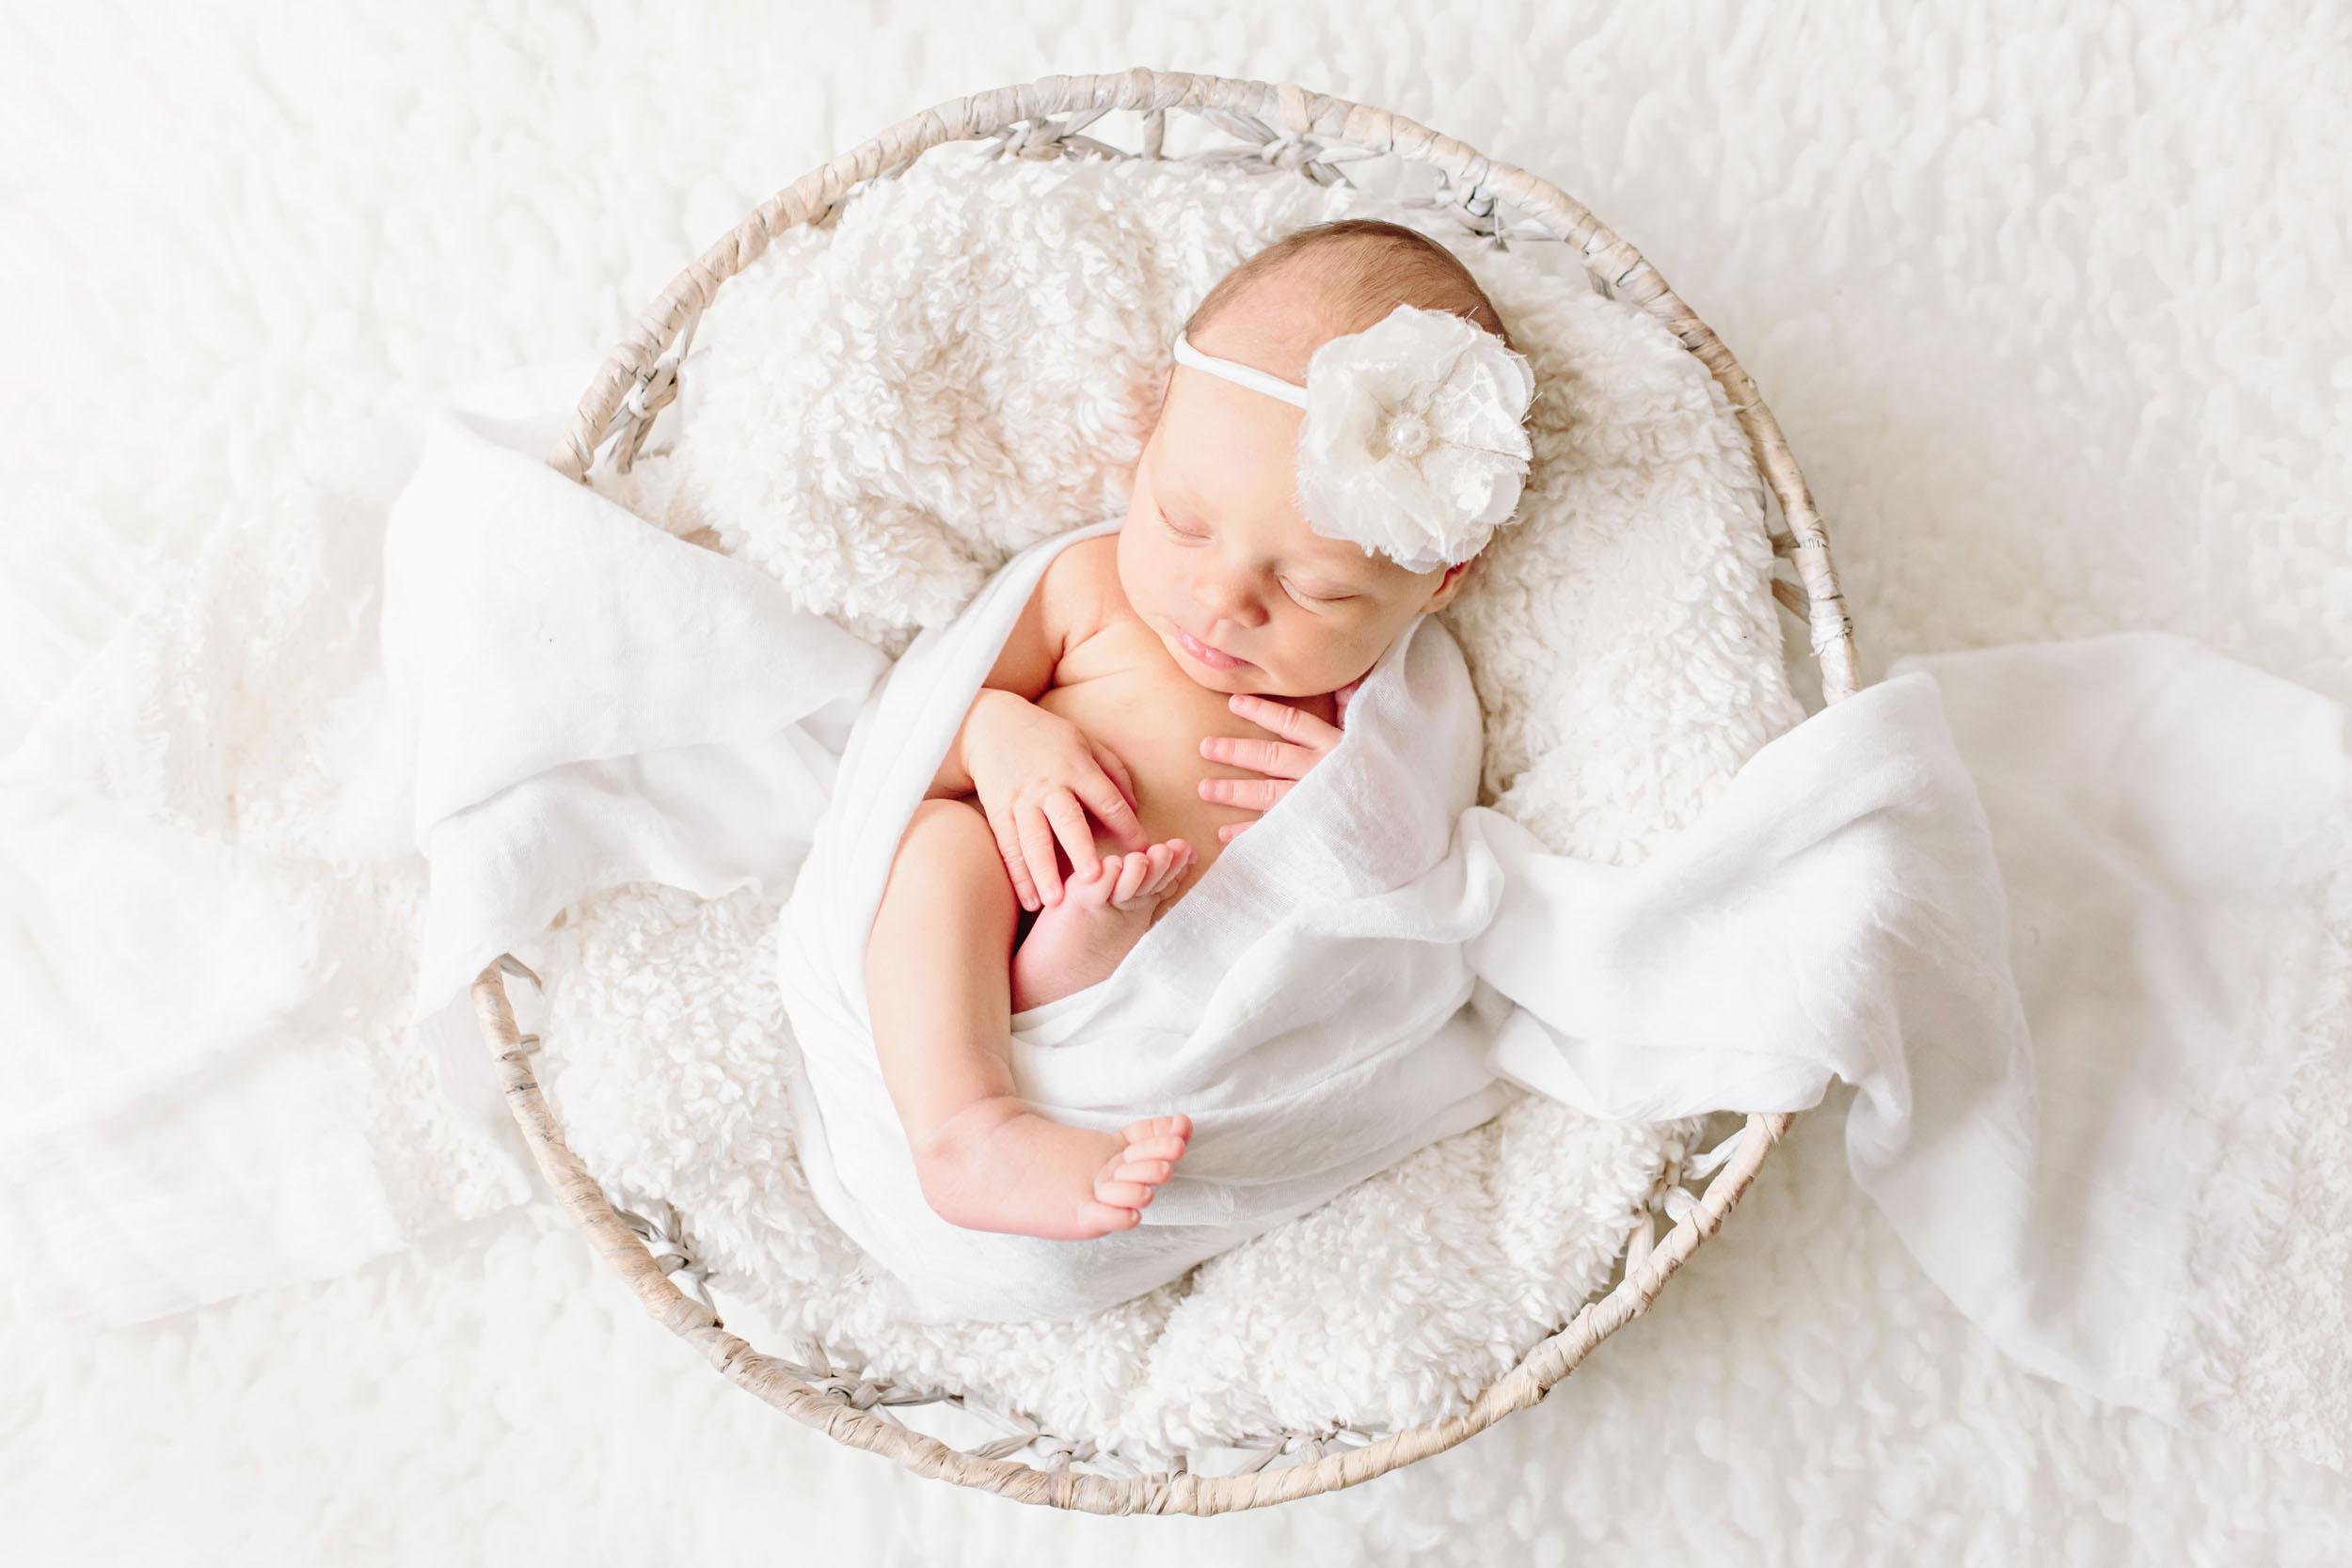 Crystal Lake Illinois Newborn Session_Cassie Schott Photography.jpg